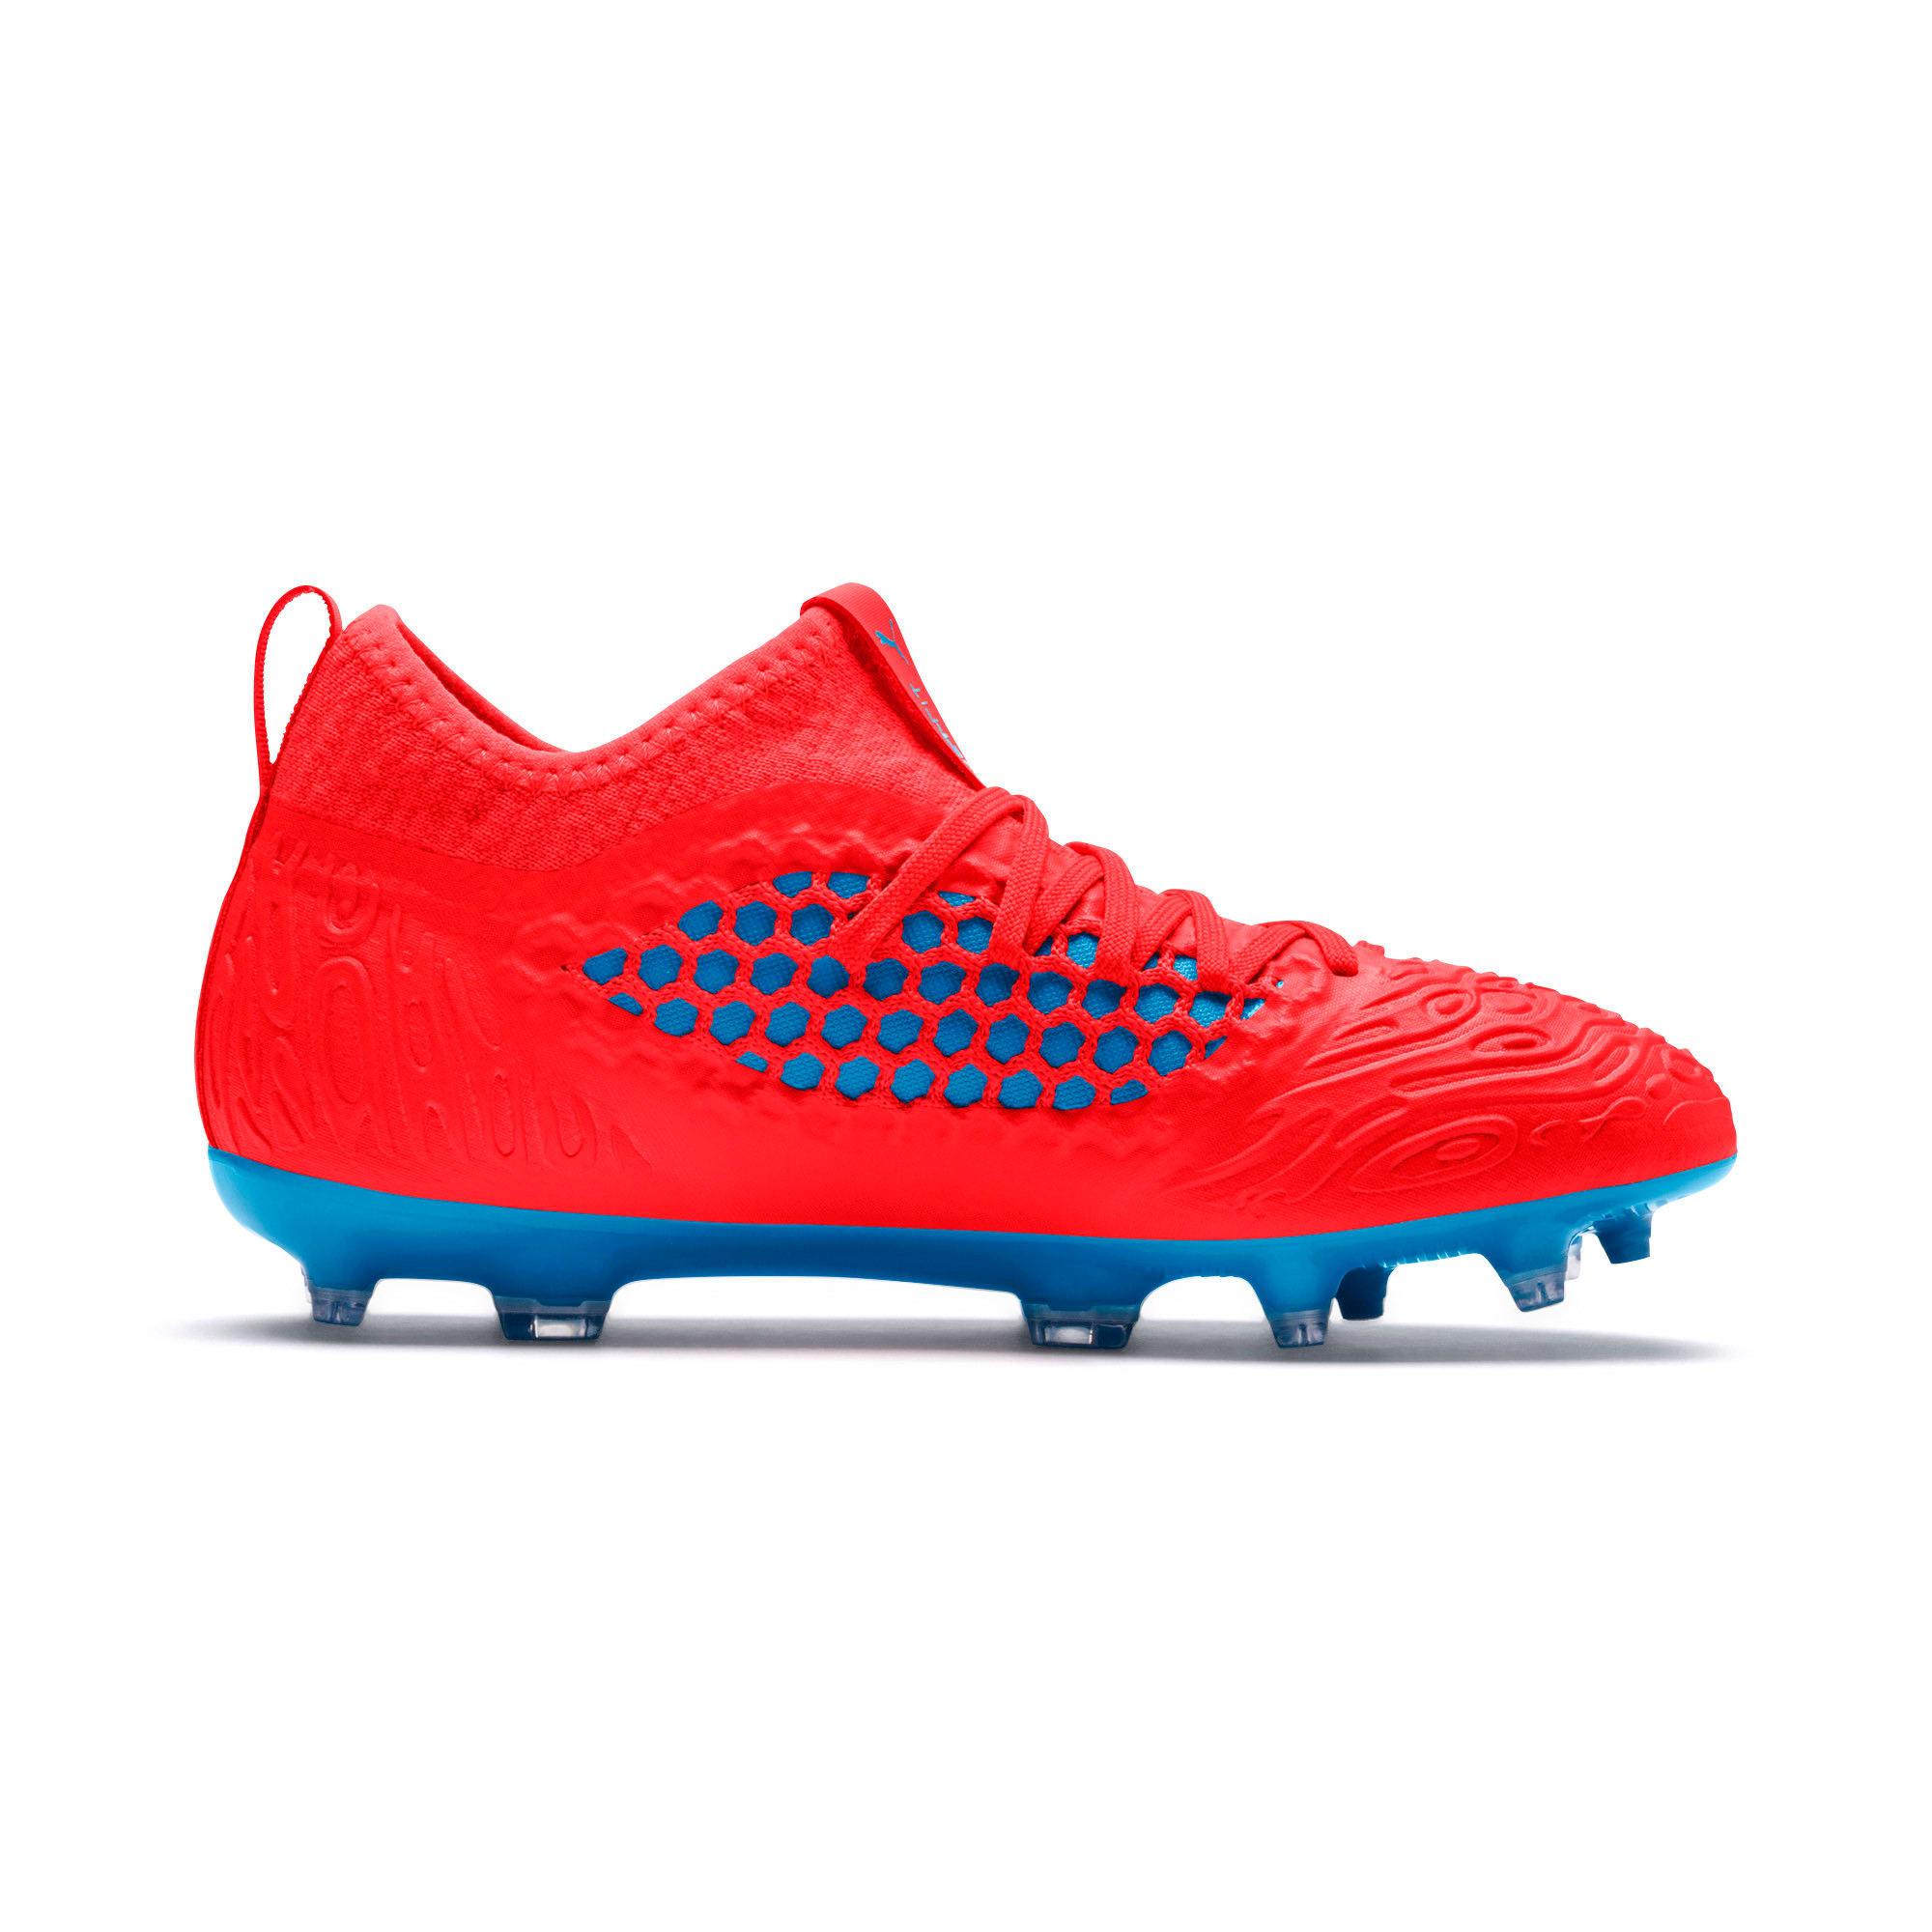 Thumbnail 5 of FUTURE 19.3 NETFIT FG/AG Soccer Cleats JR, Red Blast-Bleu Azur, medium